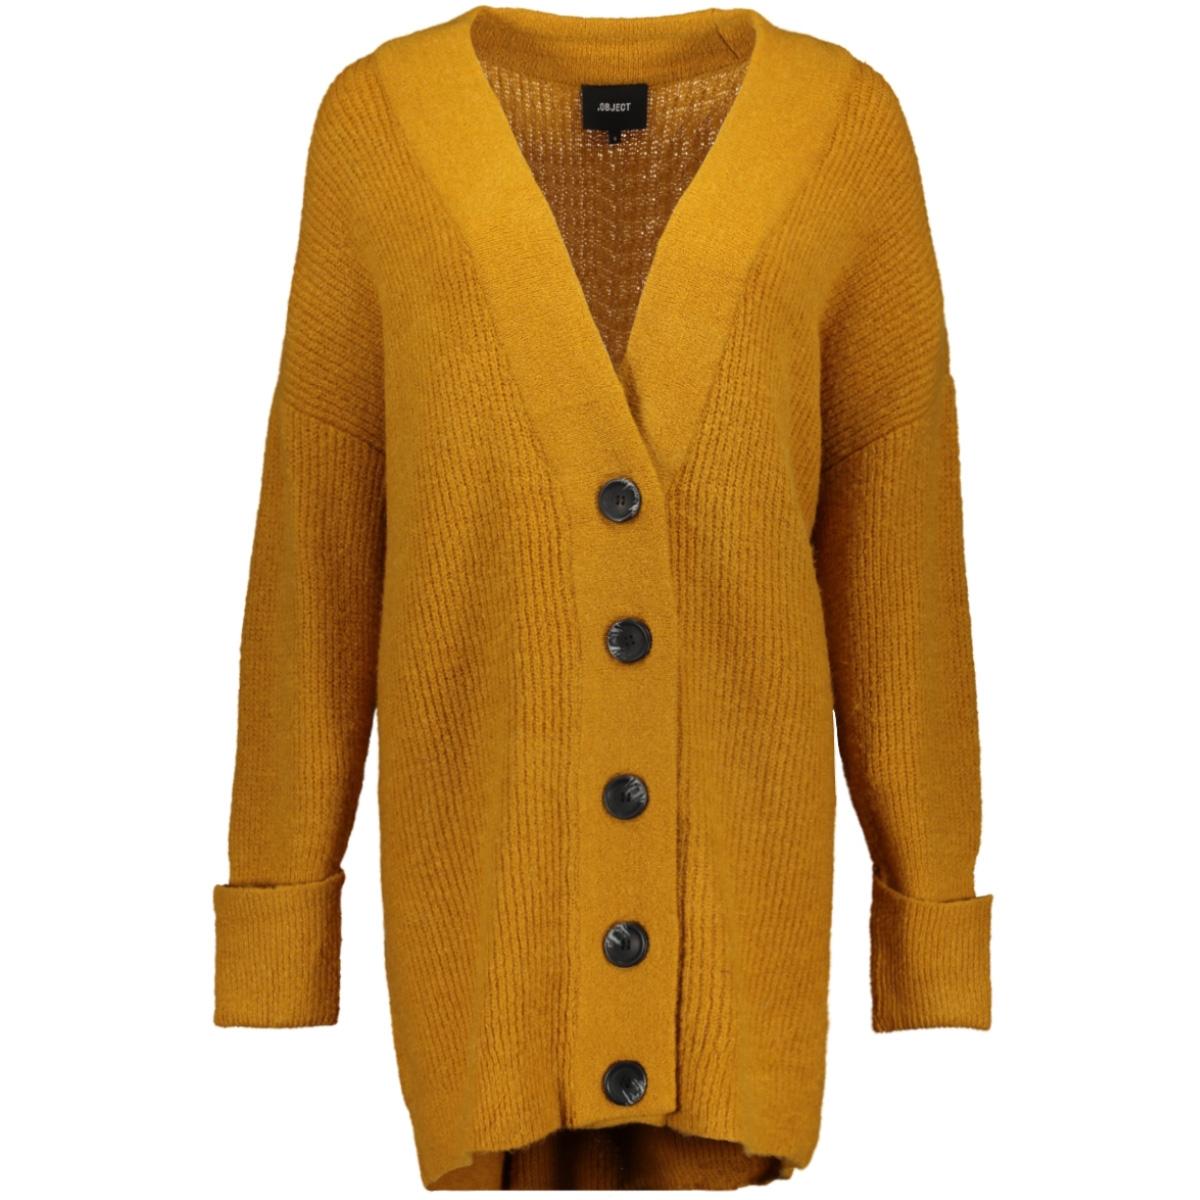 objtianna l/s knit  cardigan a div 23030963 object vest buckthorn brown